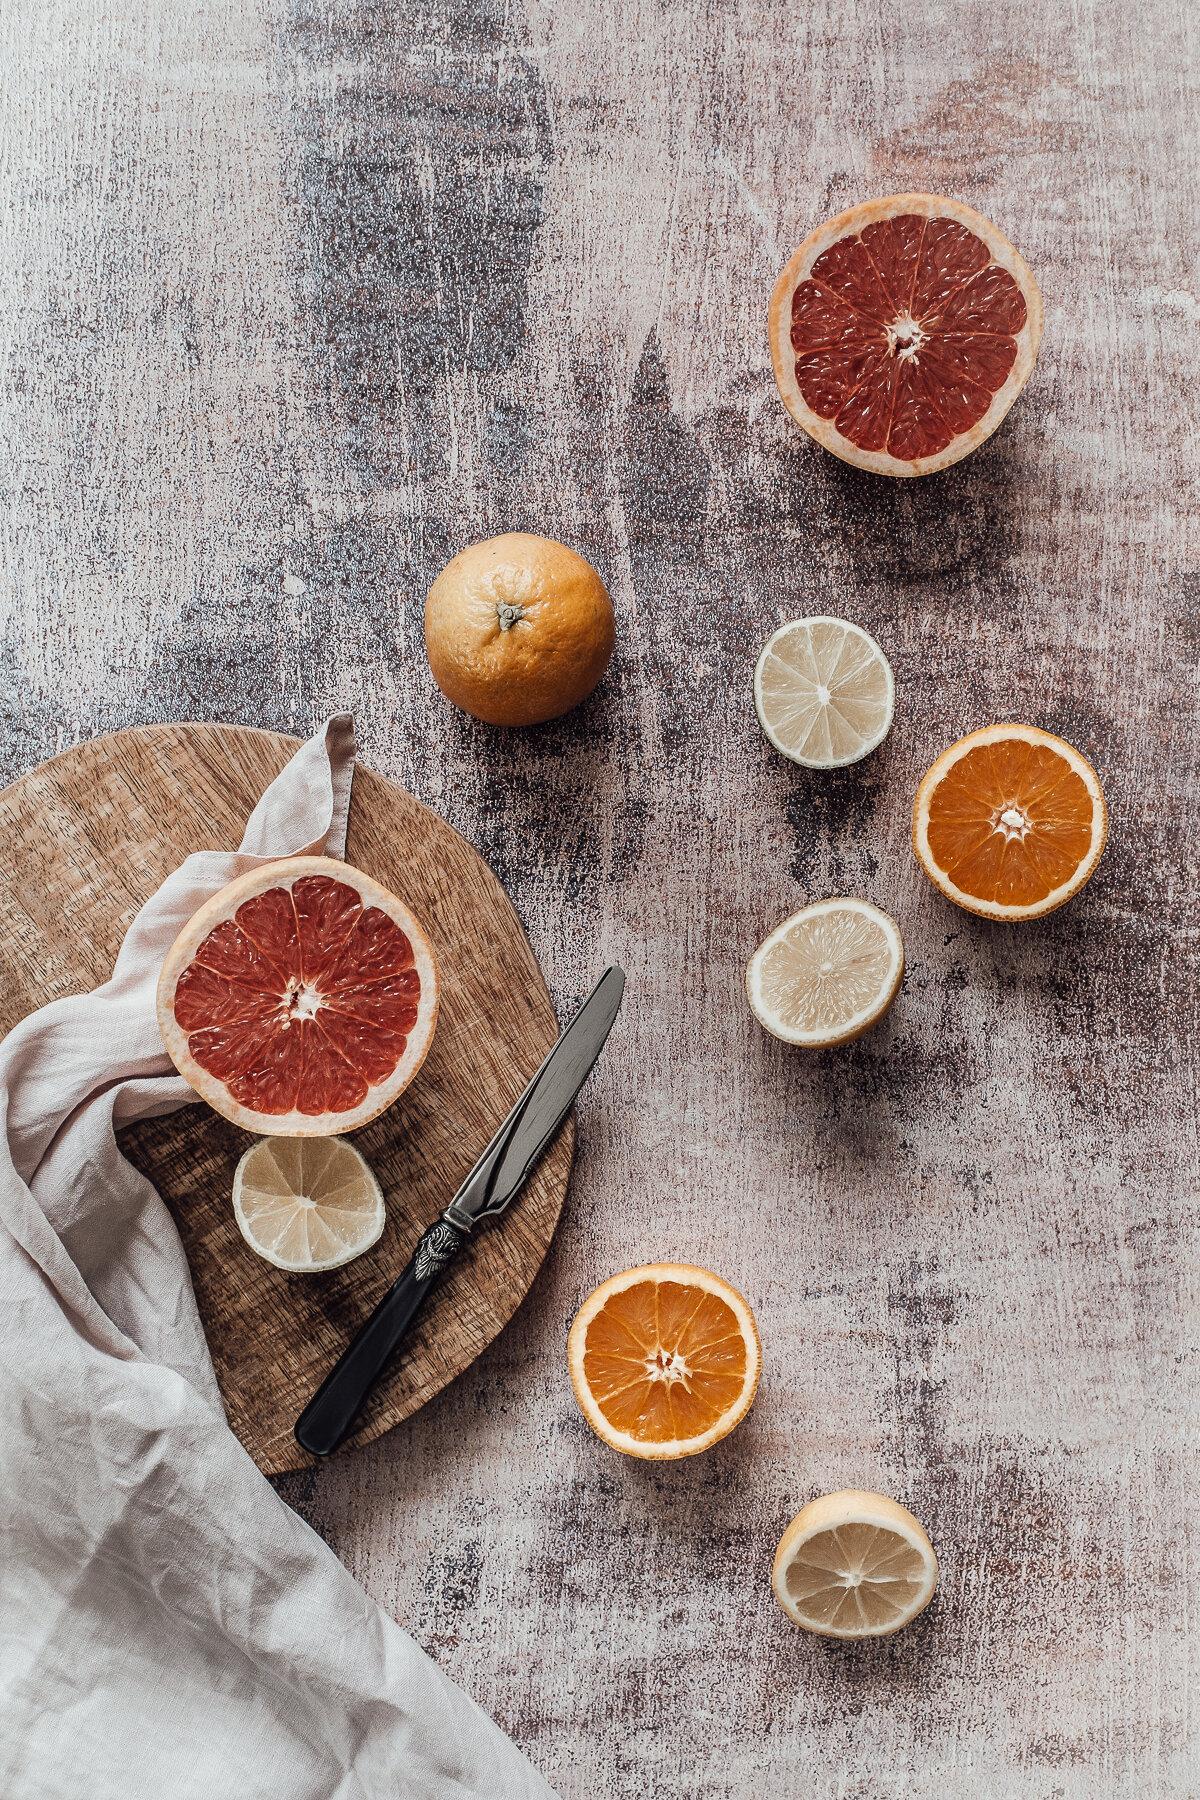 Orange Pound Cake - Fujifilm XT3 - Yes! Please Enjoy by Fanning Tseng.jpg